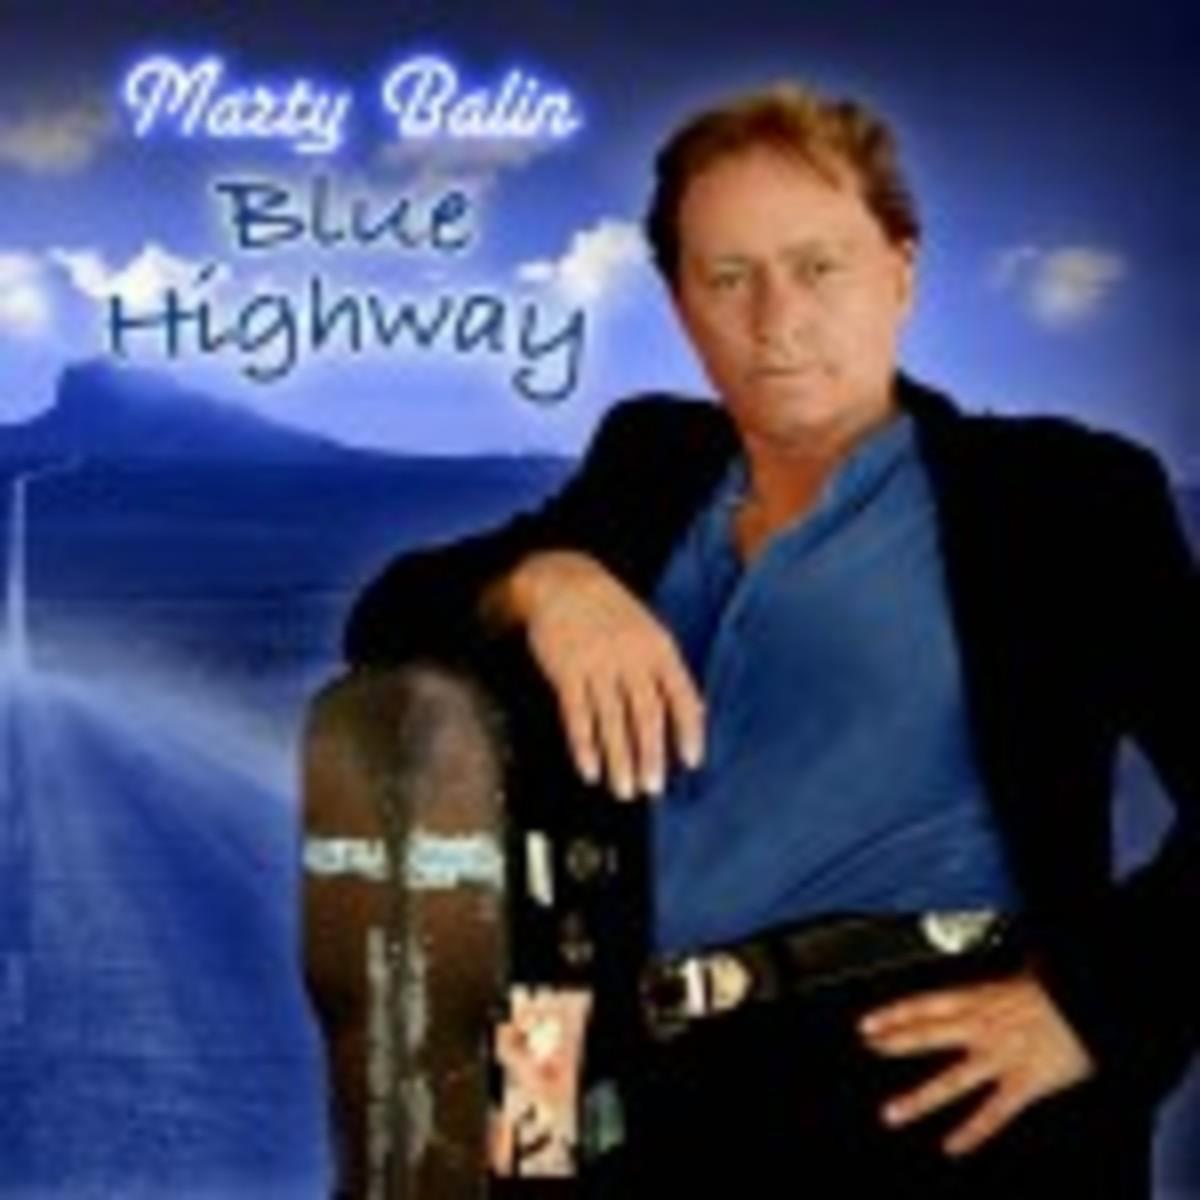 Marty Balin Blue Highway